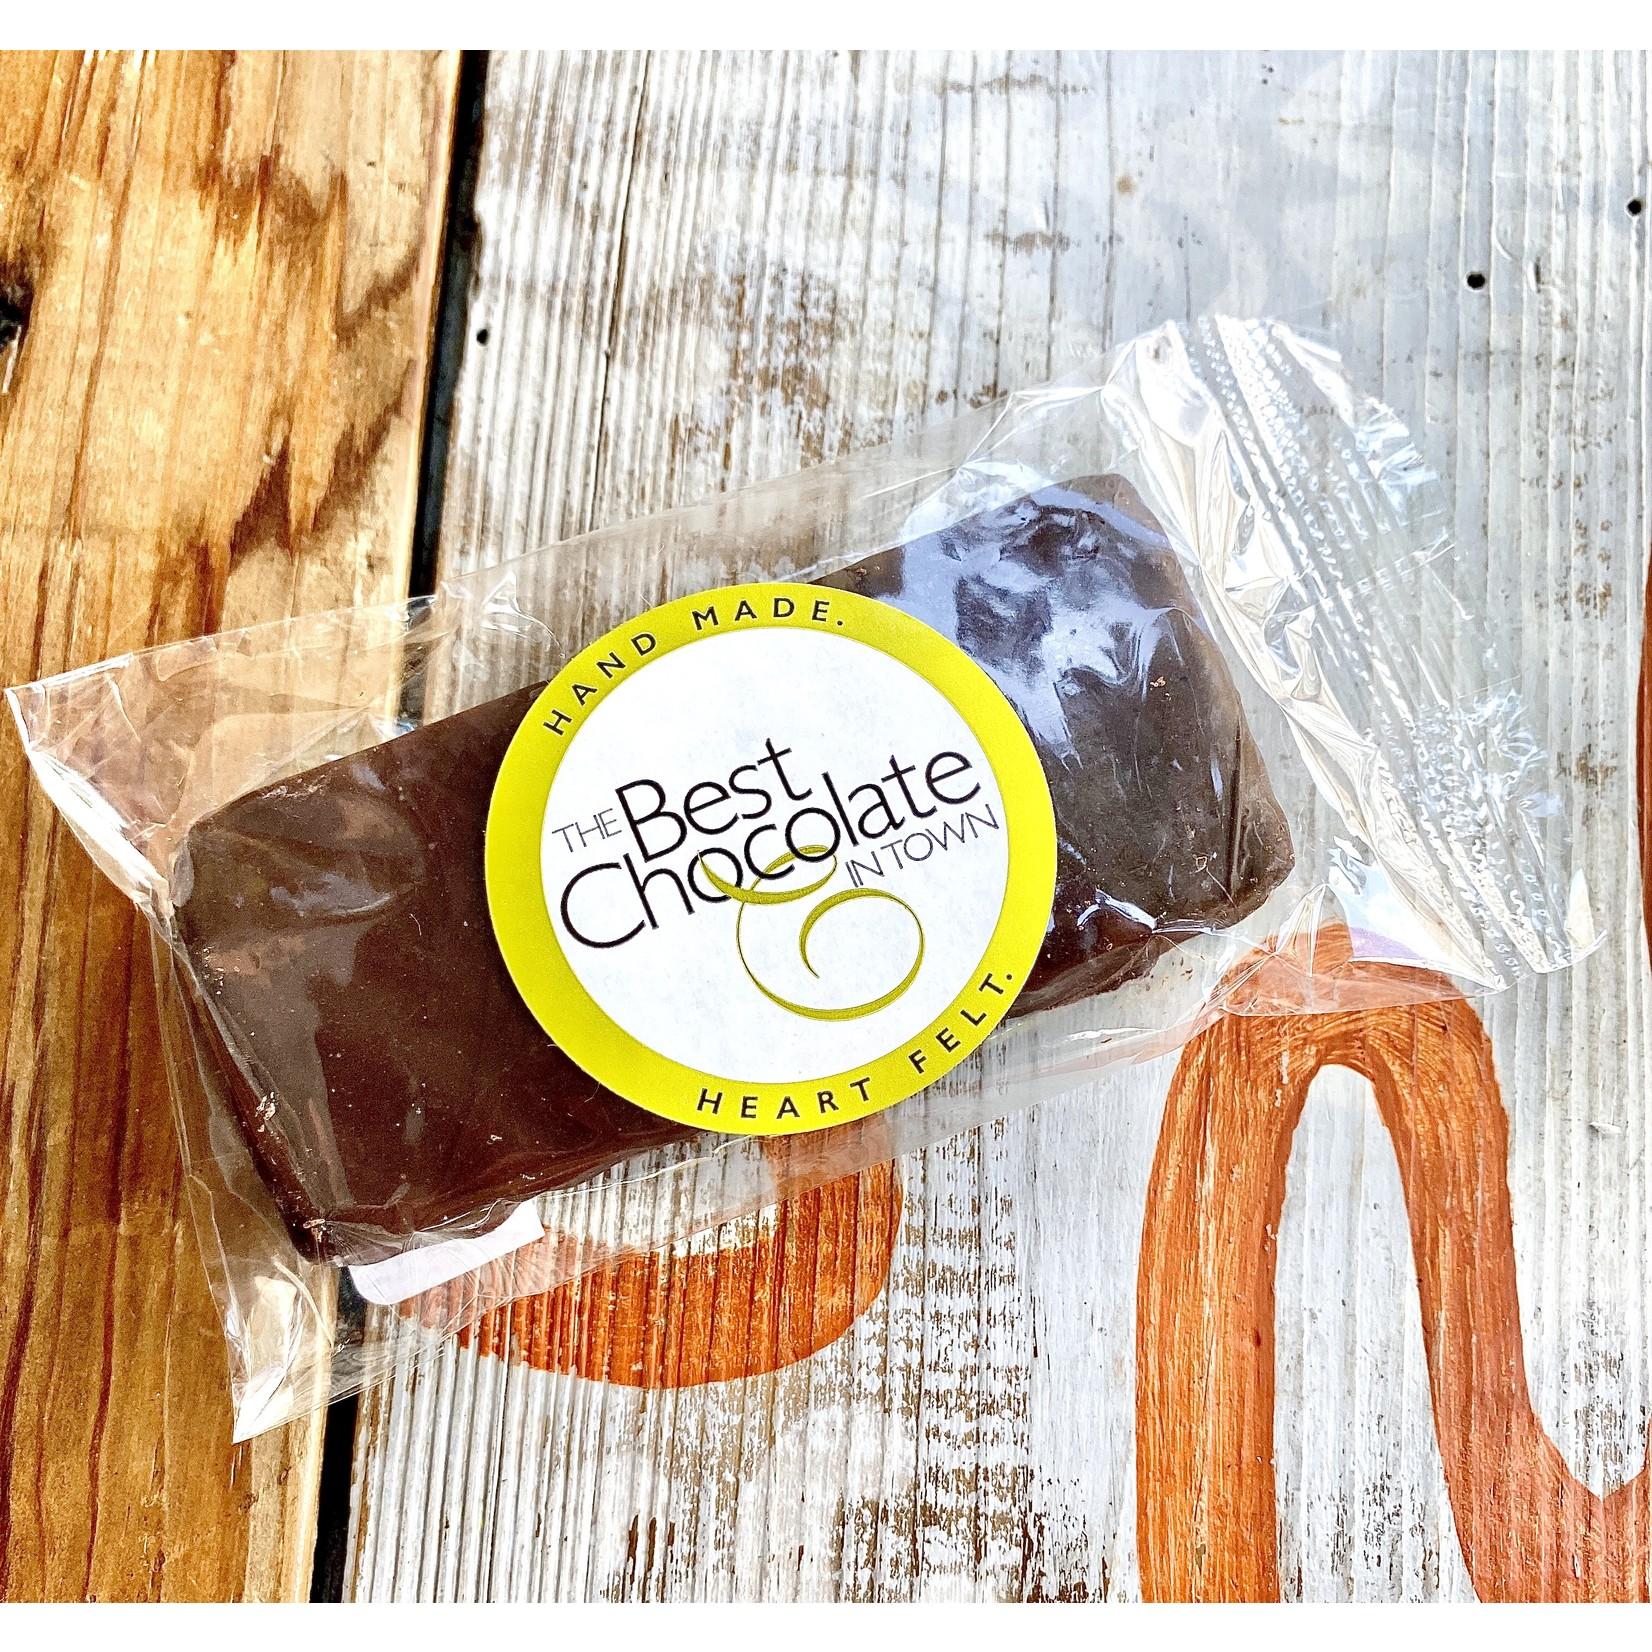 The Best Chocolate in Town (POC) Chocolate Kanga Bar